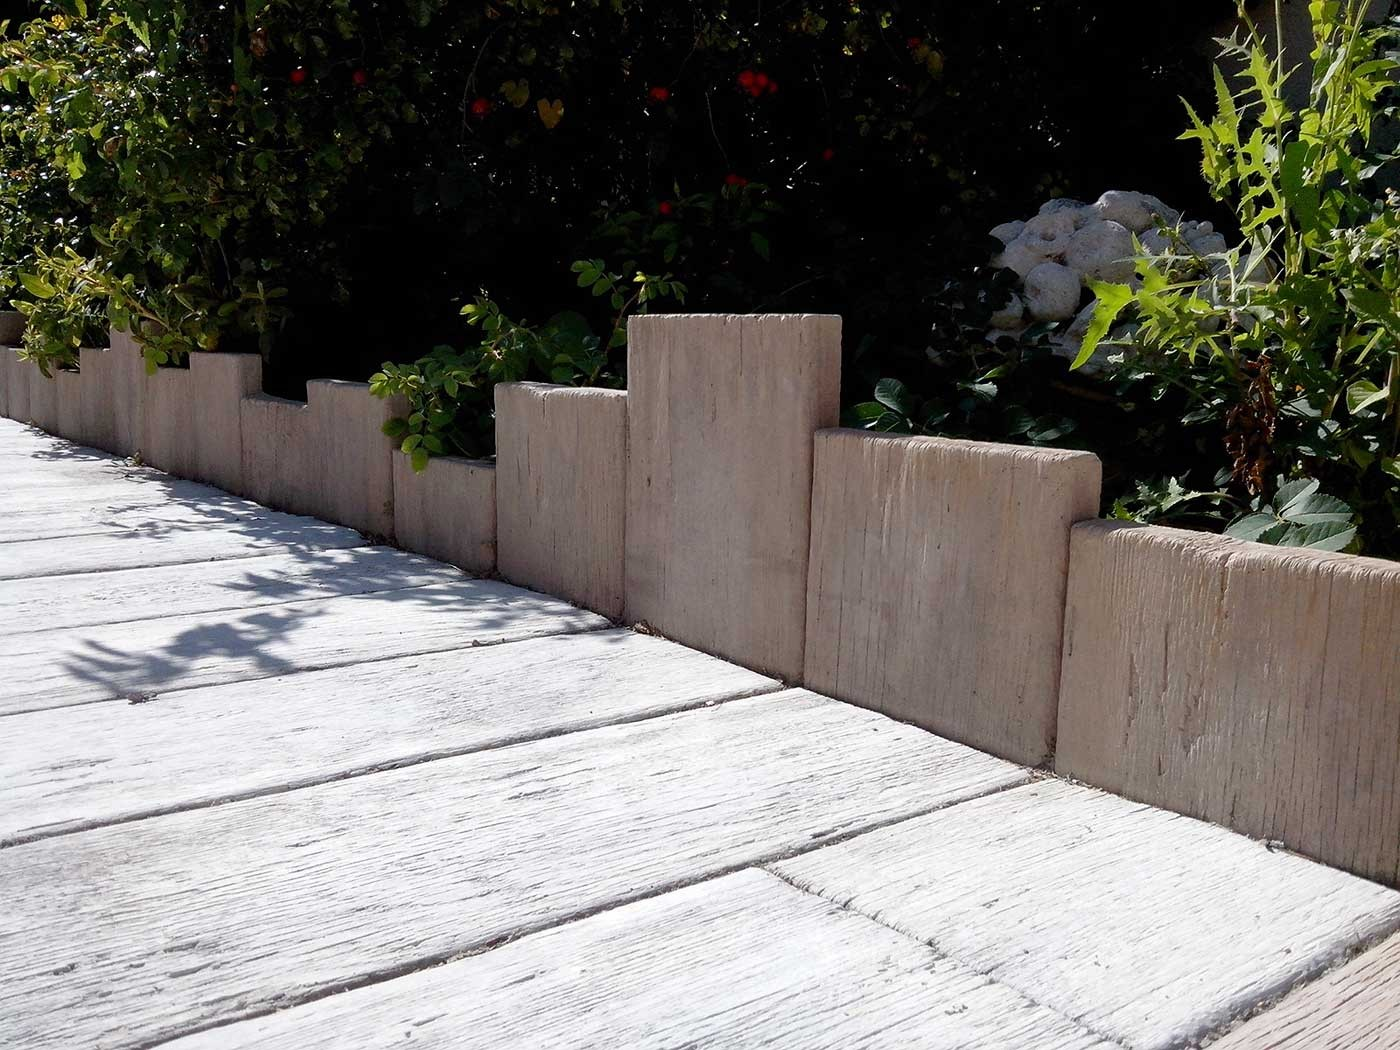 Bordure De Jardin Recycle > Bordure Pour Jardin Angle Pour Bordure En Acier Corten Floranica